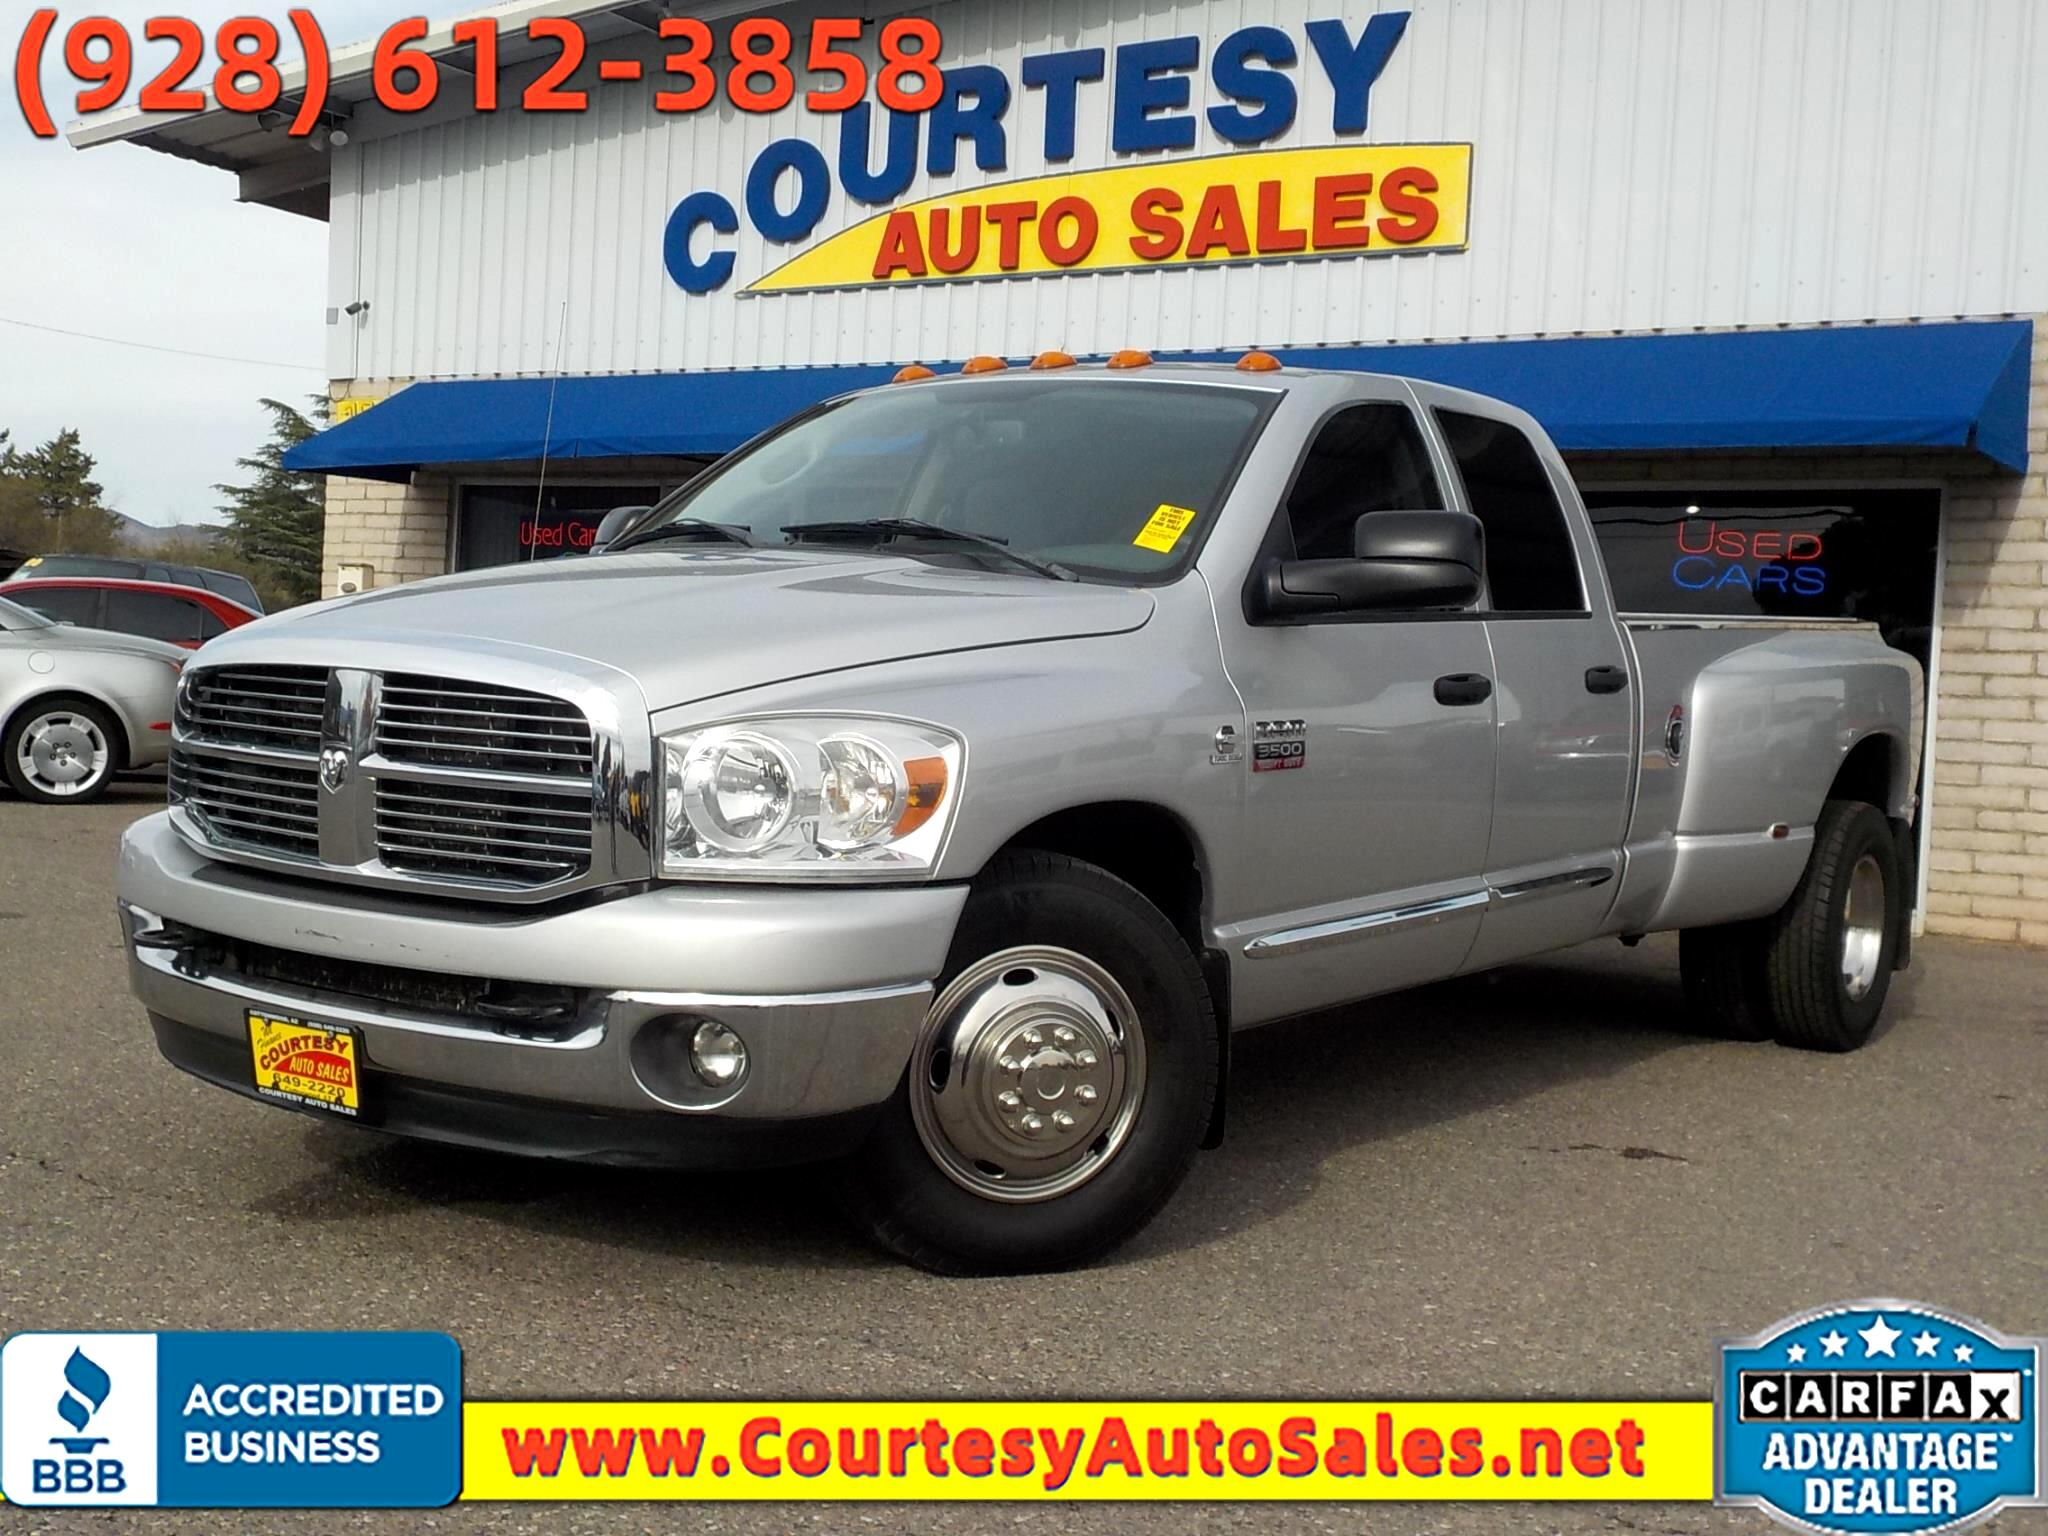 Used Cars for Sale Cottonwood AZ 86326 Courtesy Auto Sales